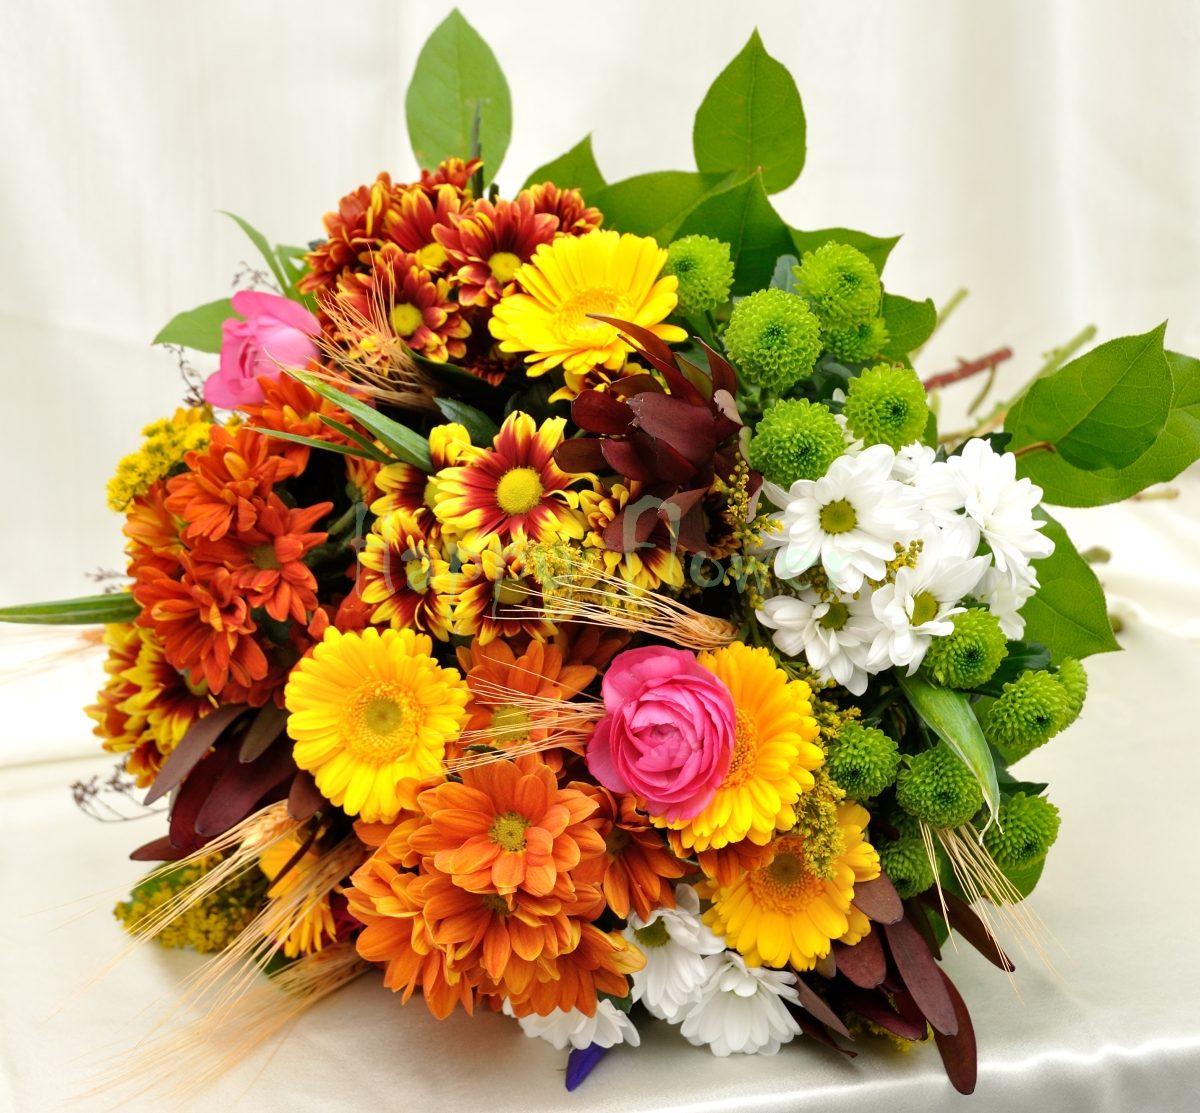 Buchete de flori foto 76